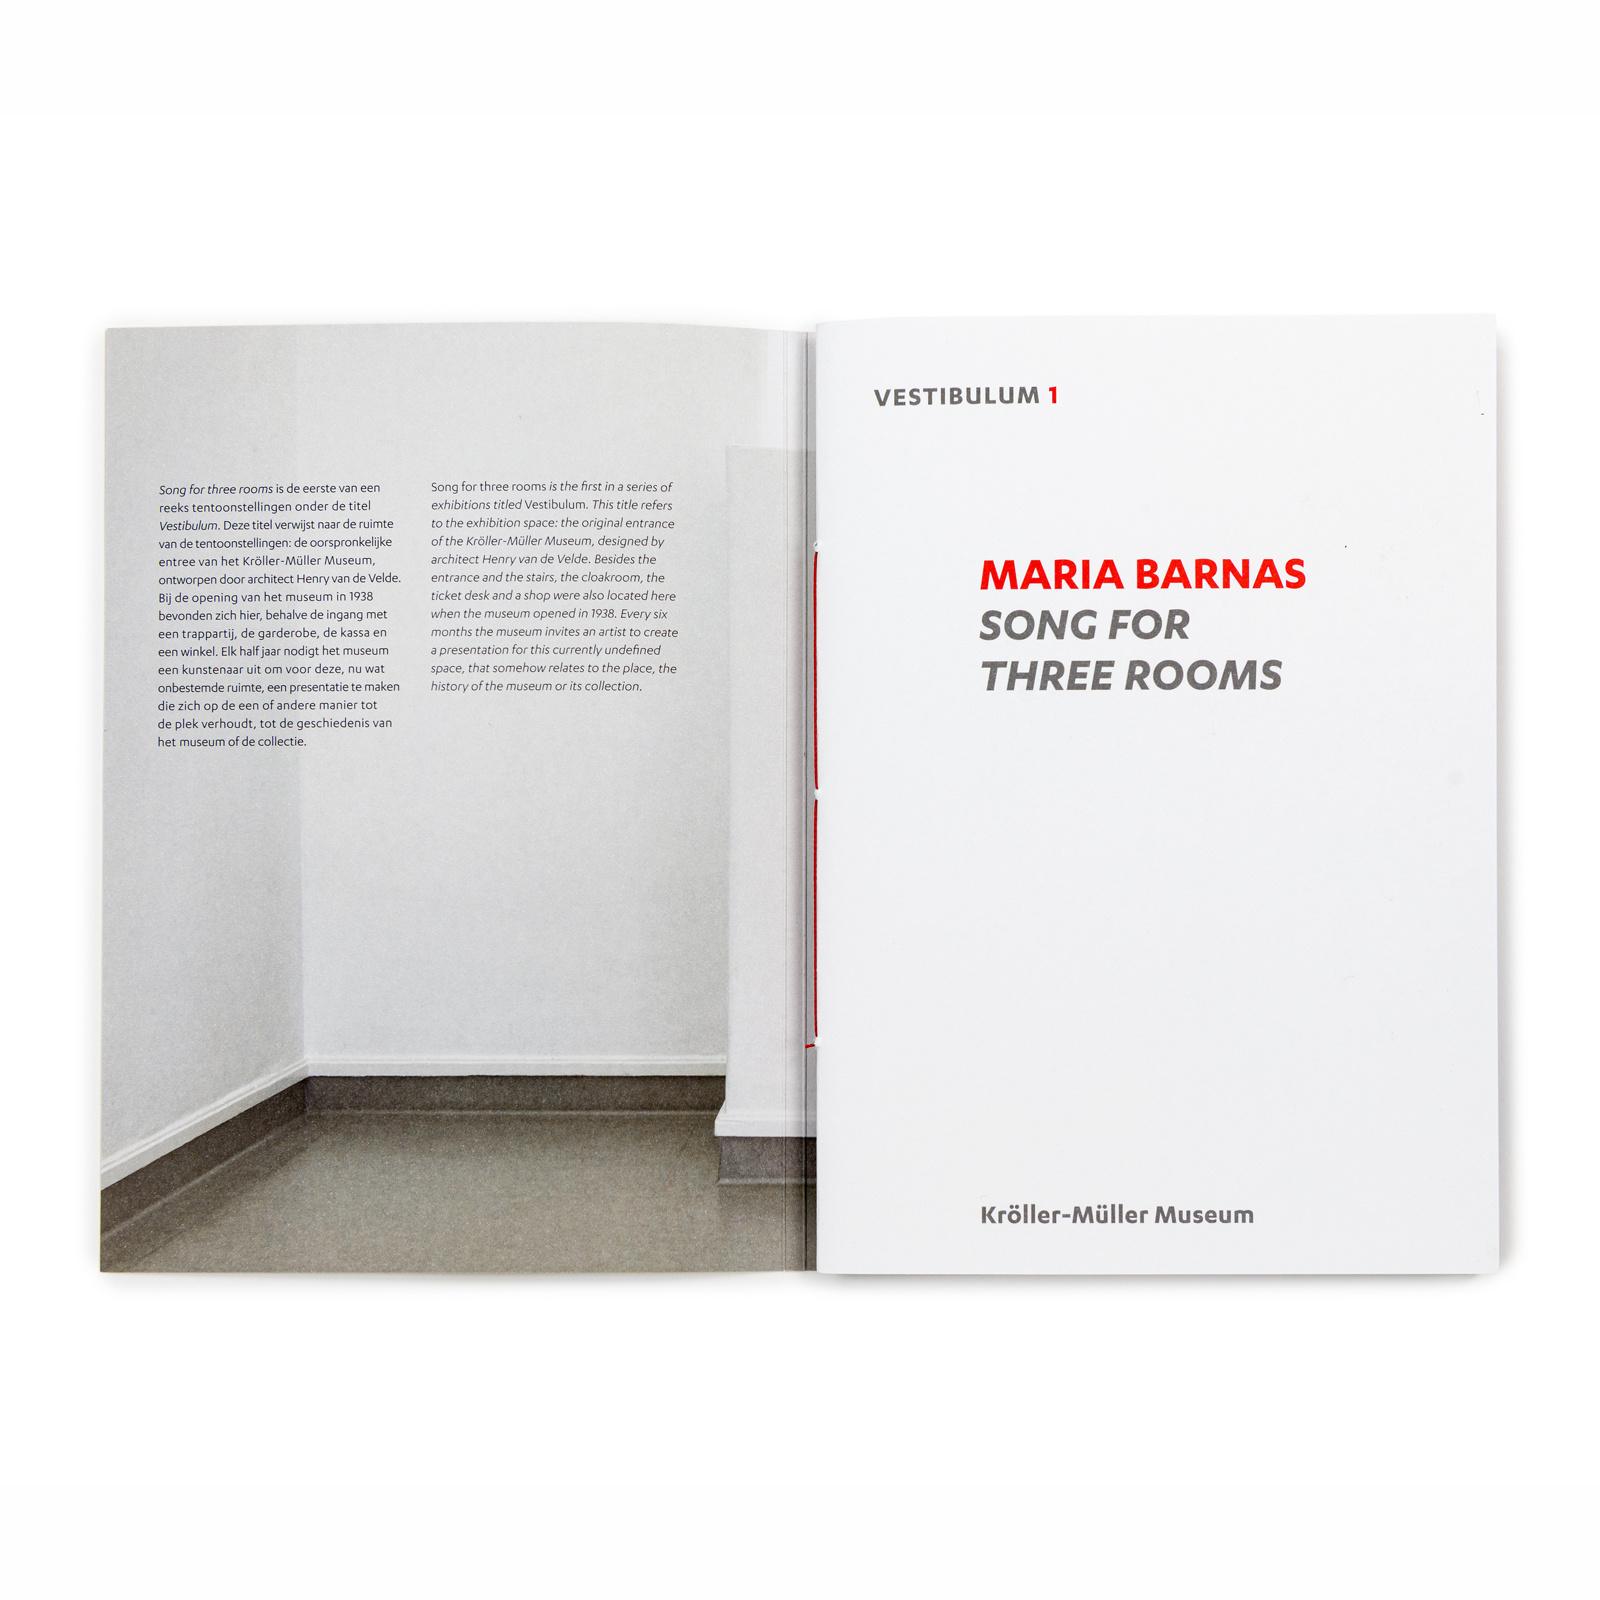 Vestibulum 1: Maria Barnas - Song for three rooms